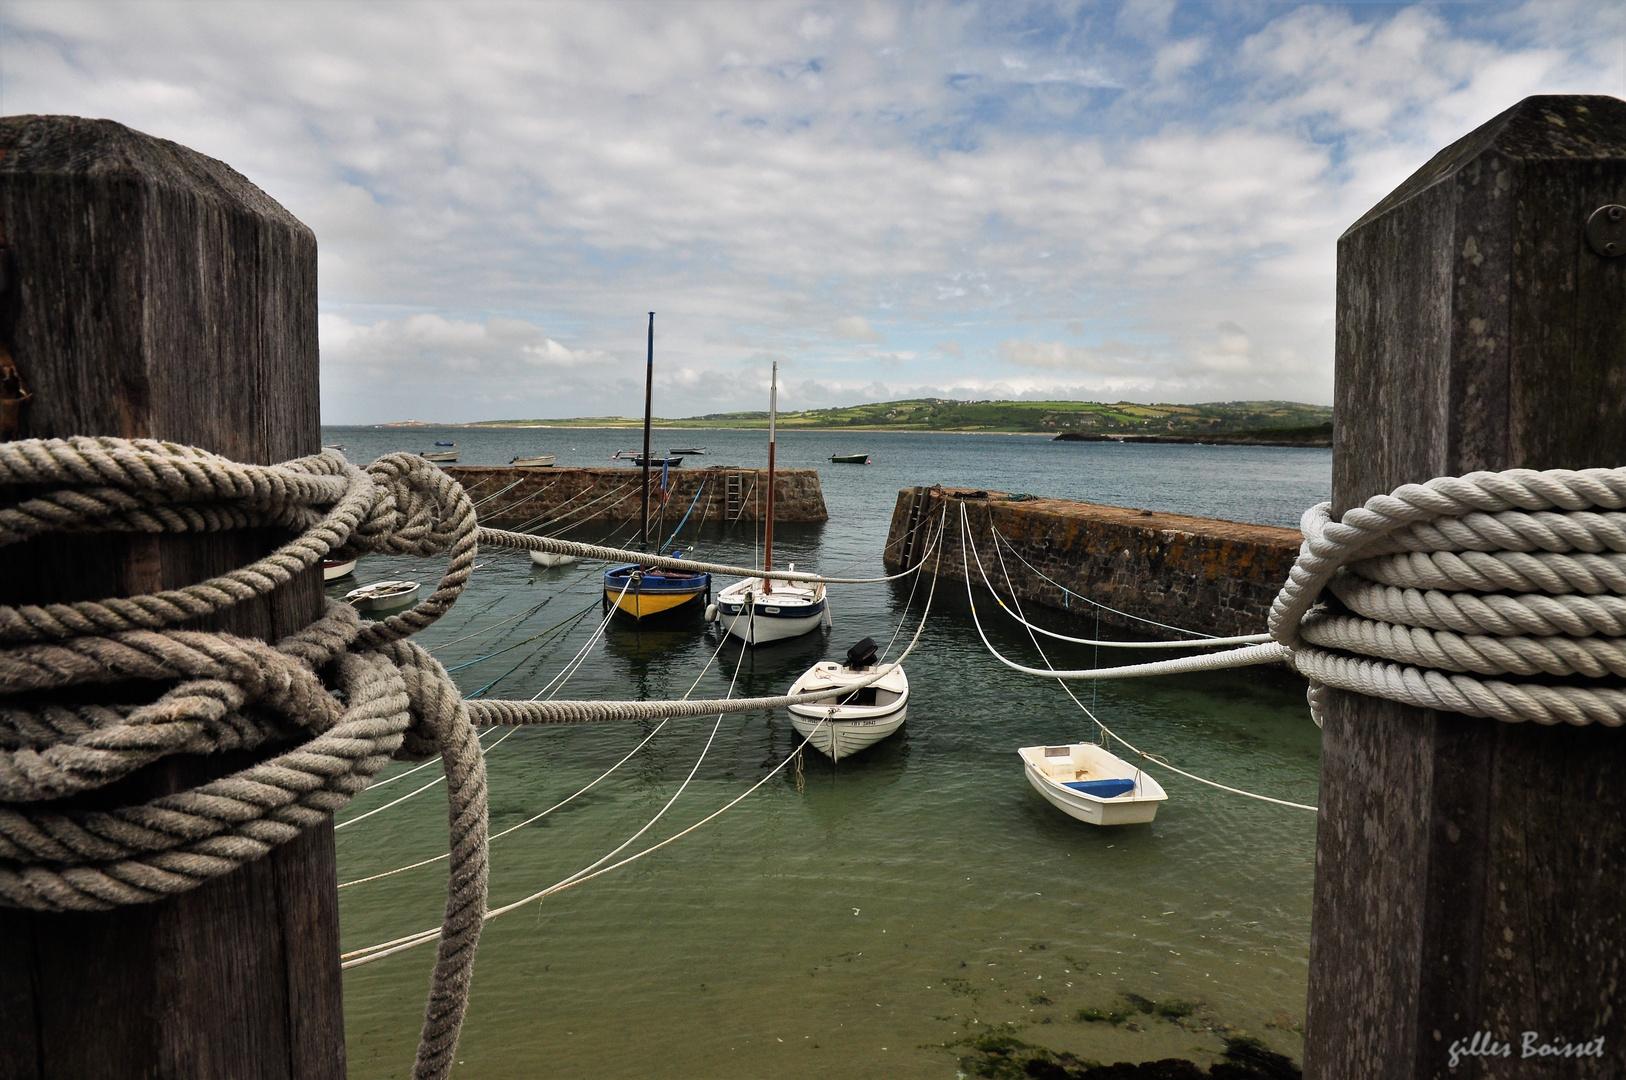 les amarres de port Racine